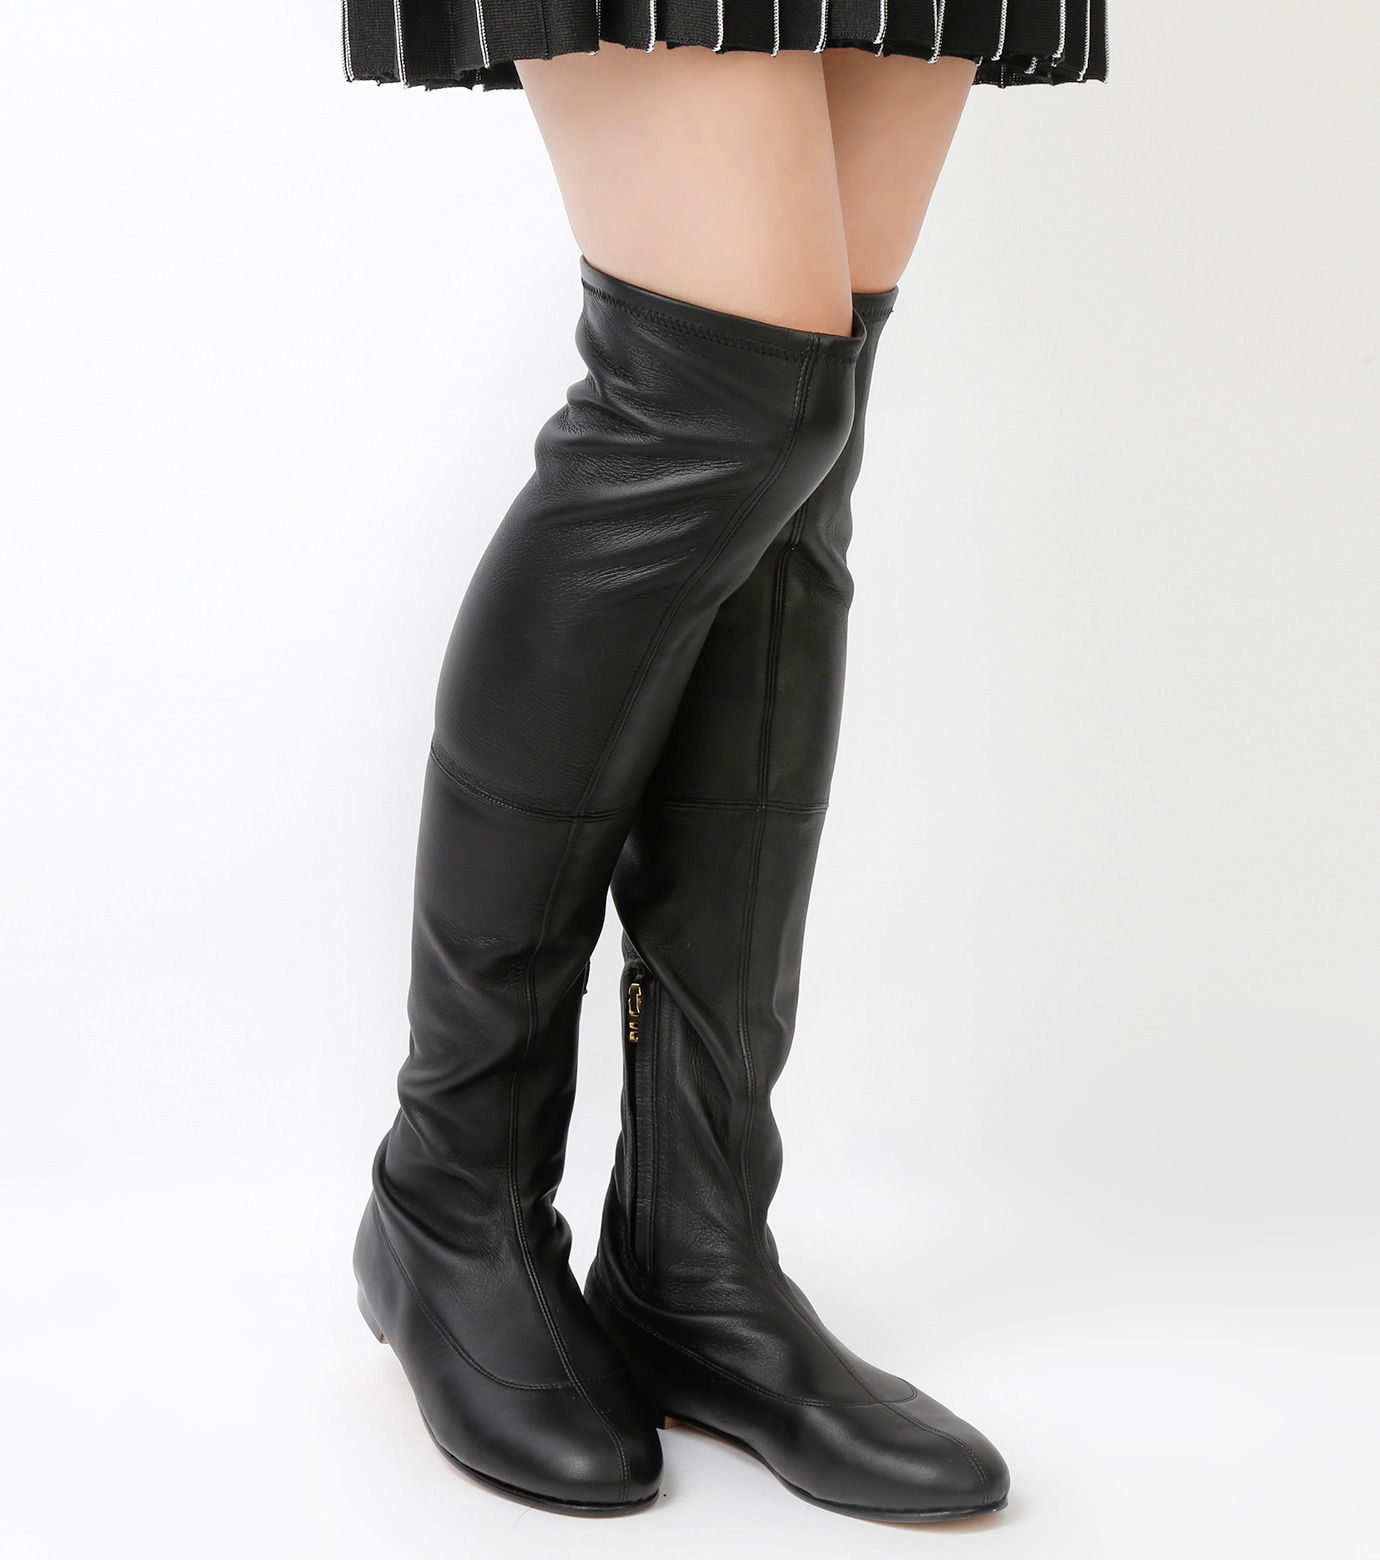 PIPPICHIC(ピッピシック)のStrech Knee High Boots-BLACK(ブーツ/boots)-PP15-STR-N14-13 拡大詳細画像3